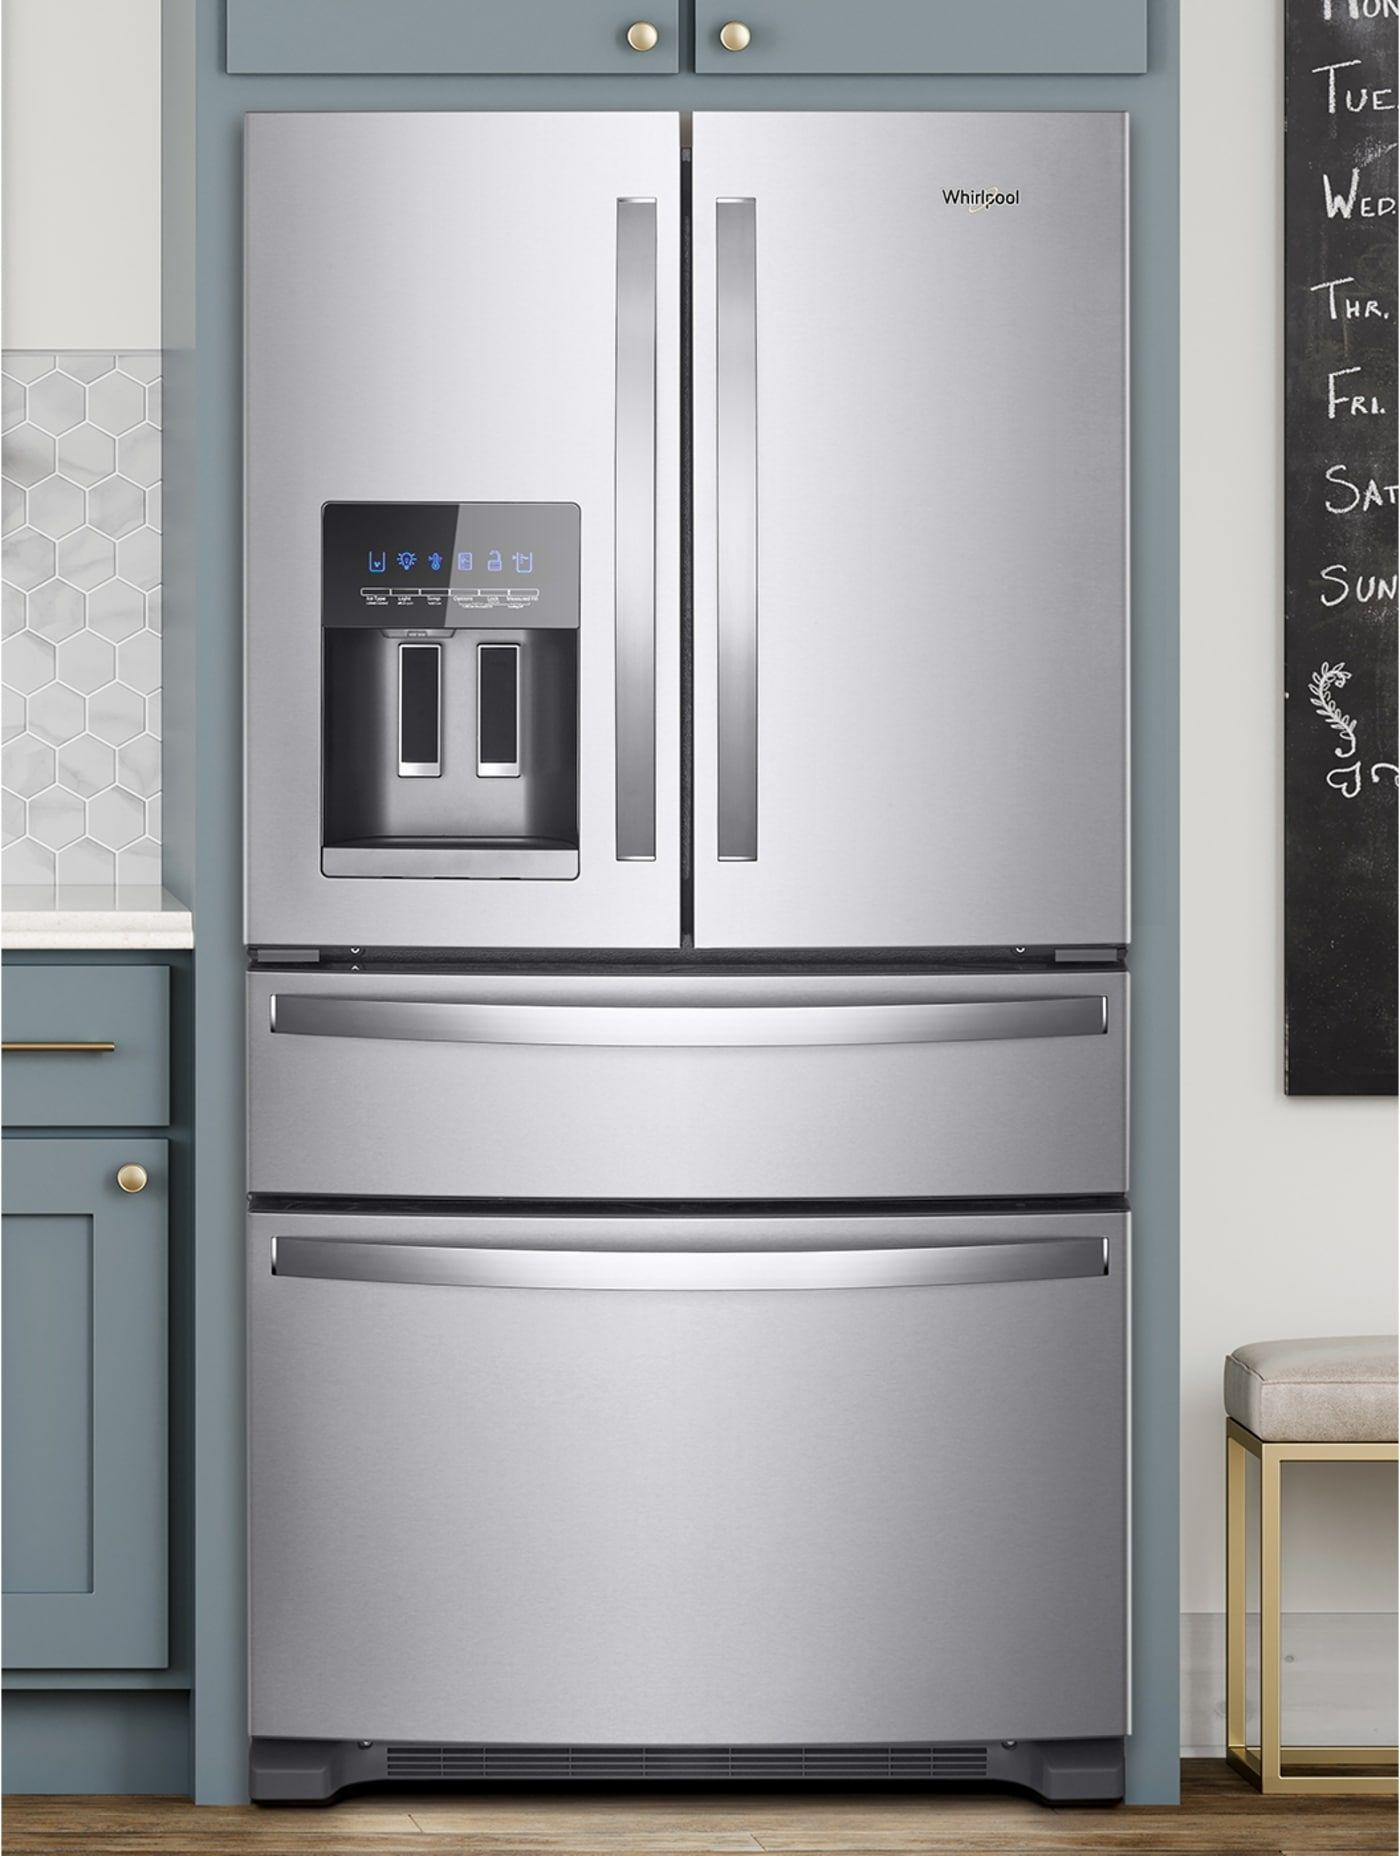 Wrx735sdhz By Whirlpool French Door Refrigerators Goedekers Com French Door Refrigerator French Doors French Door Refrigerators